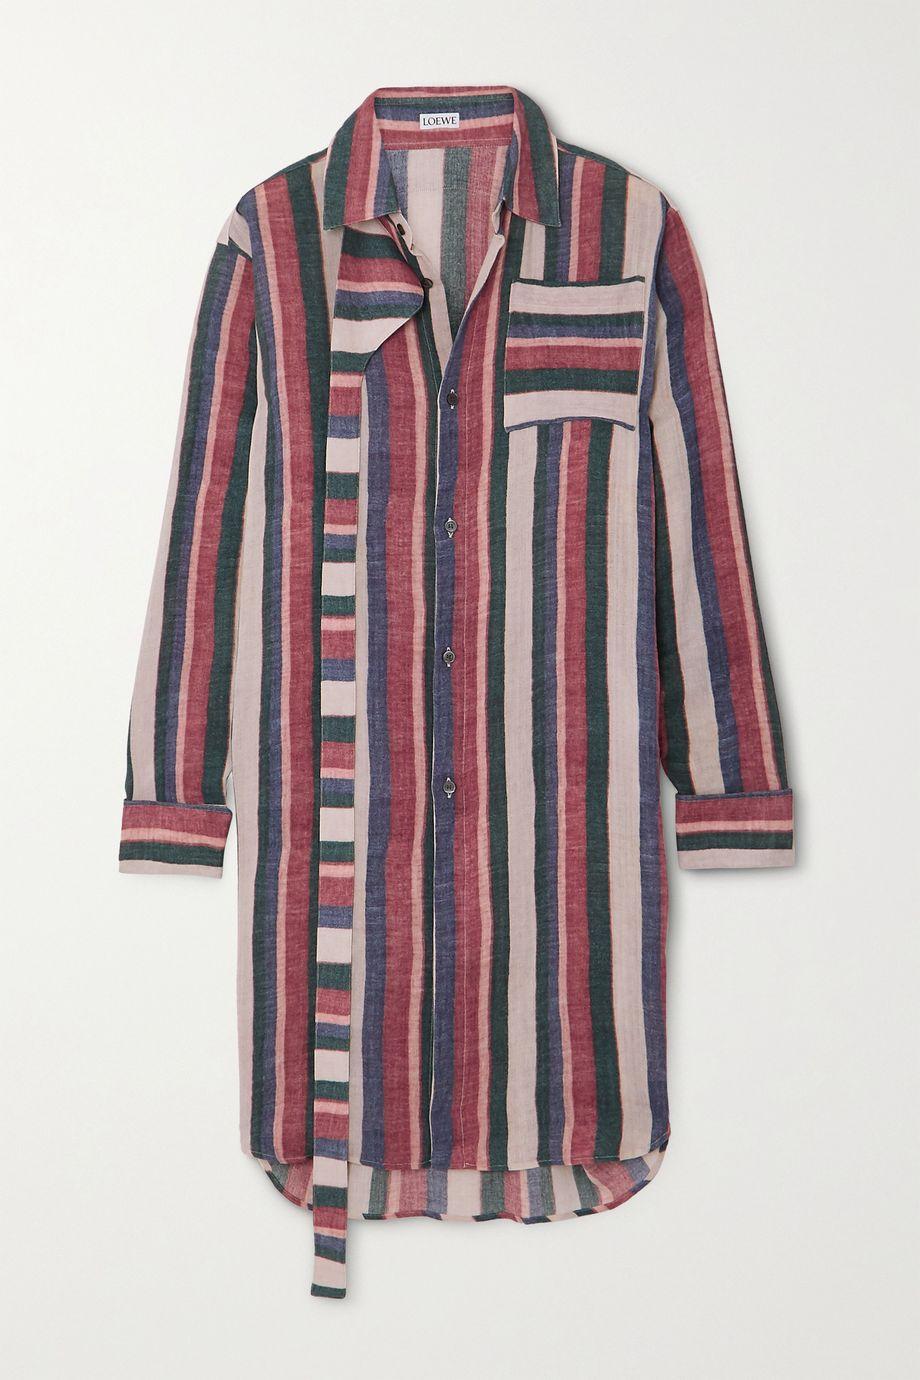 Loewe Oversized striped cotton shirt